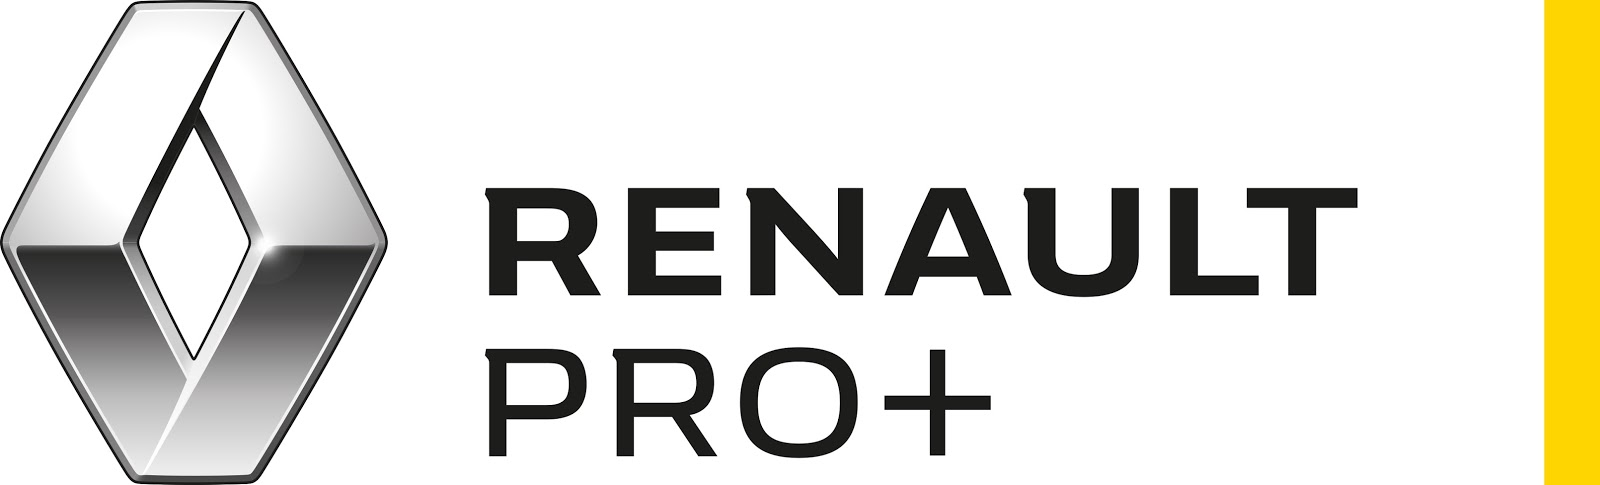 R RENAULT%2BPRO%252B%2BLOGO positive CMYK v1 Τα επαγγελματικά Renault δίπλα στις ανάγκες της αγοράς Renault, Renault Kangoo, Renault Kangoo Maxi, Renault Pro+, Επαγγελματικά